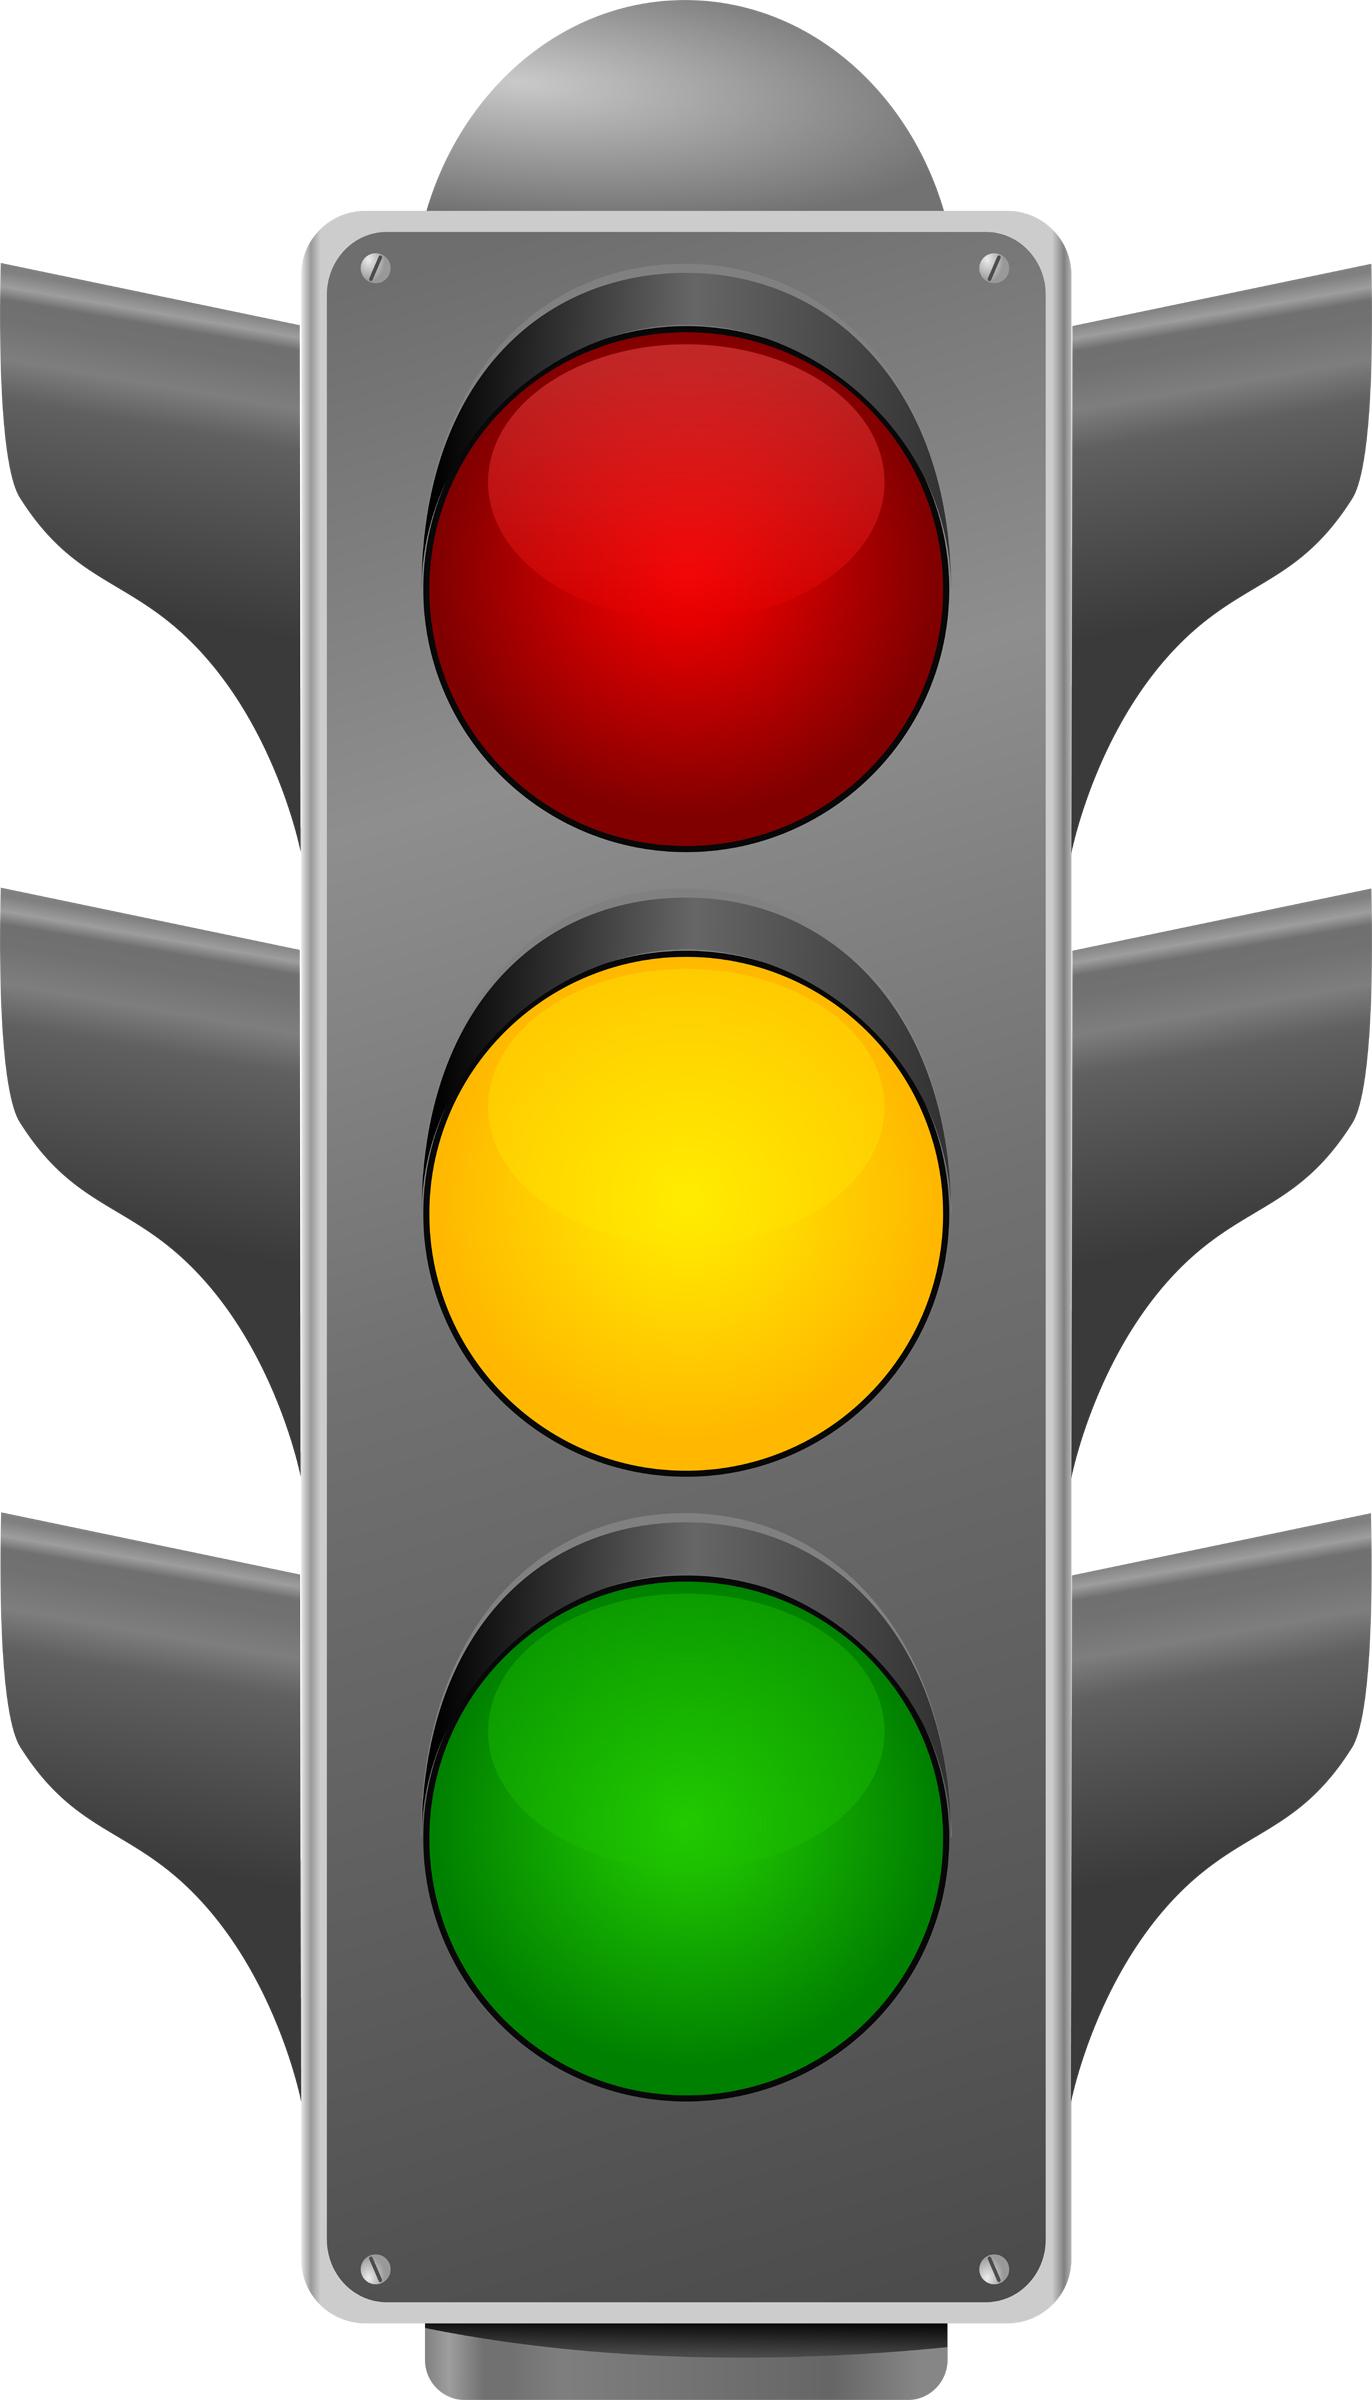 Traffic light signs clipart.